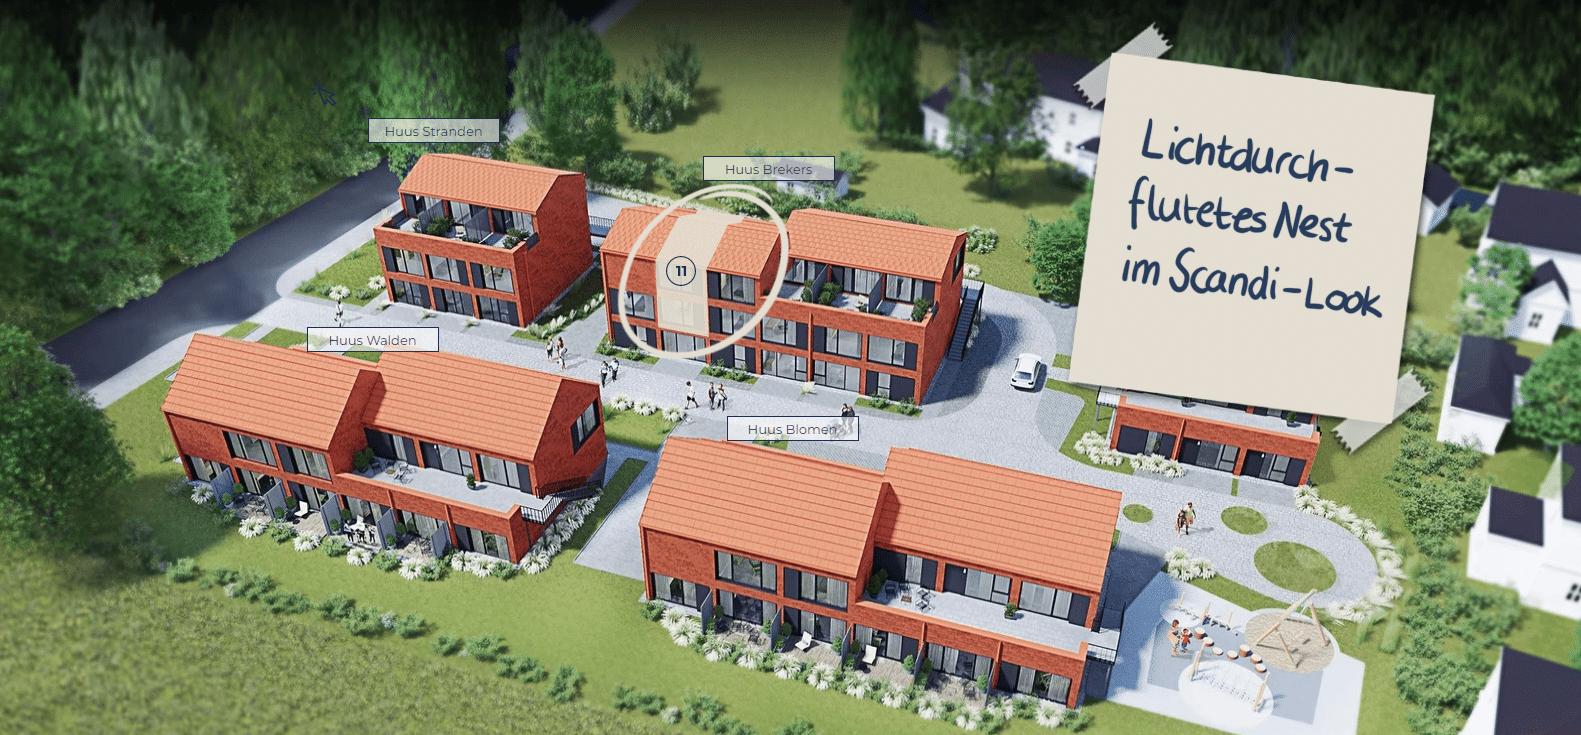 11_De ole School - Ostseeurlaub Ferienapartments Hohwacht Nähe Heiligenhafen Lütjenburg Kieler Bucht